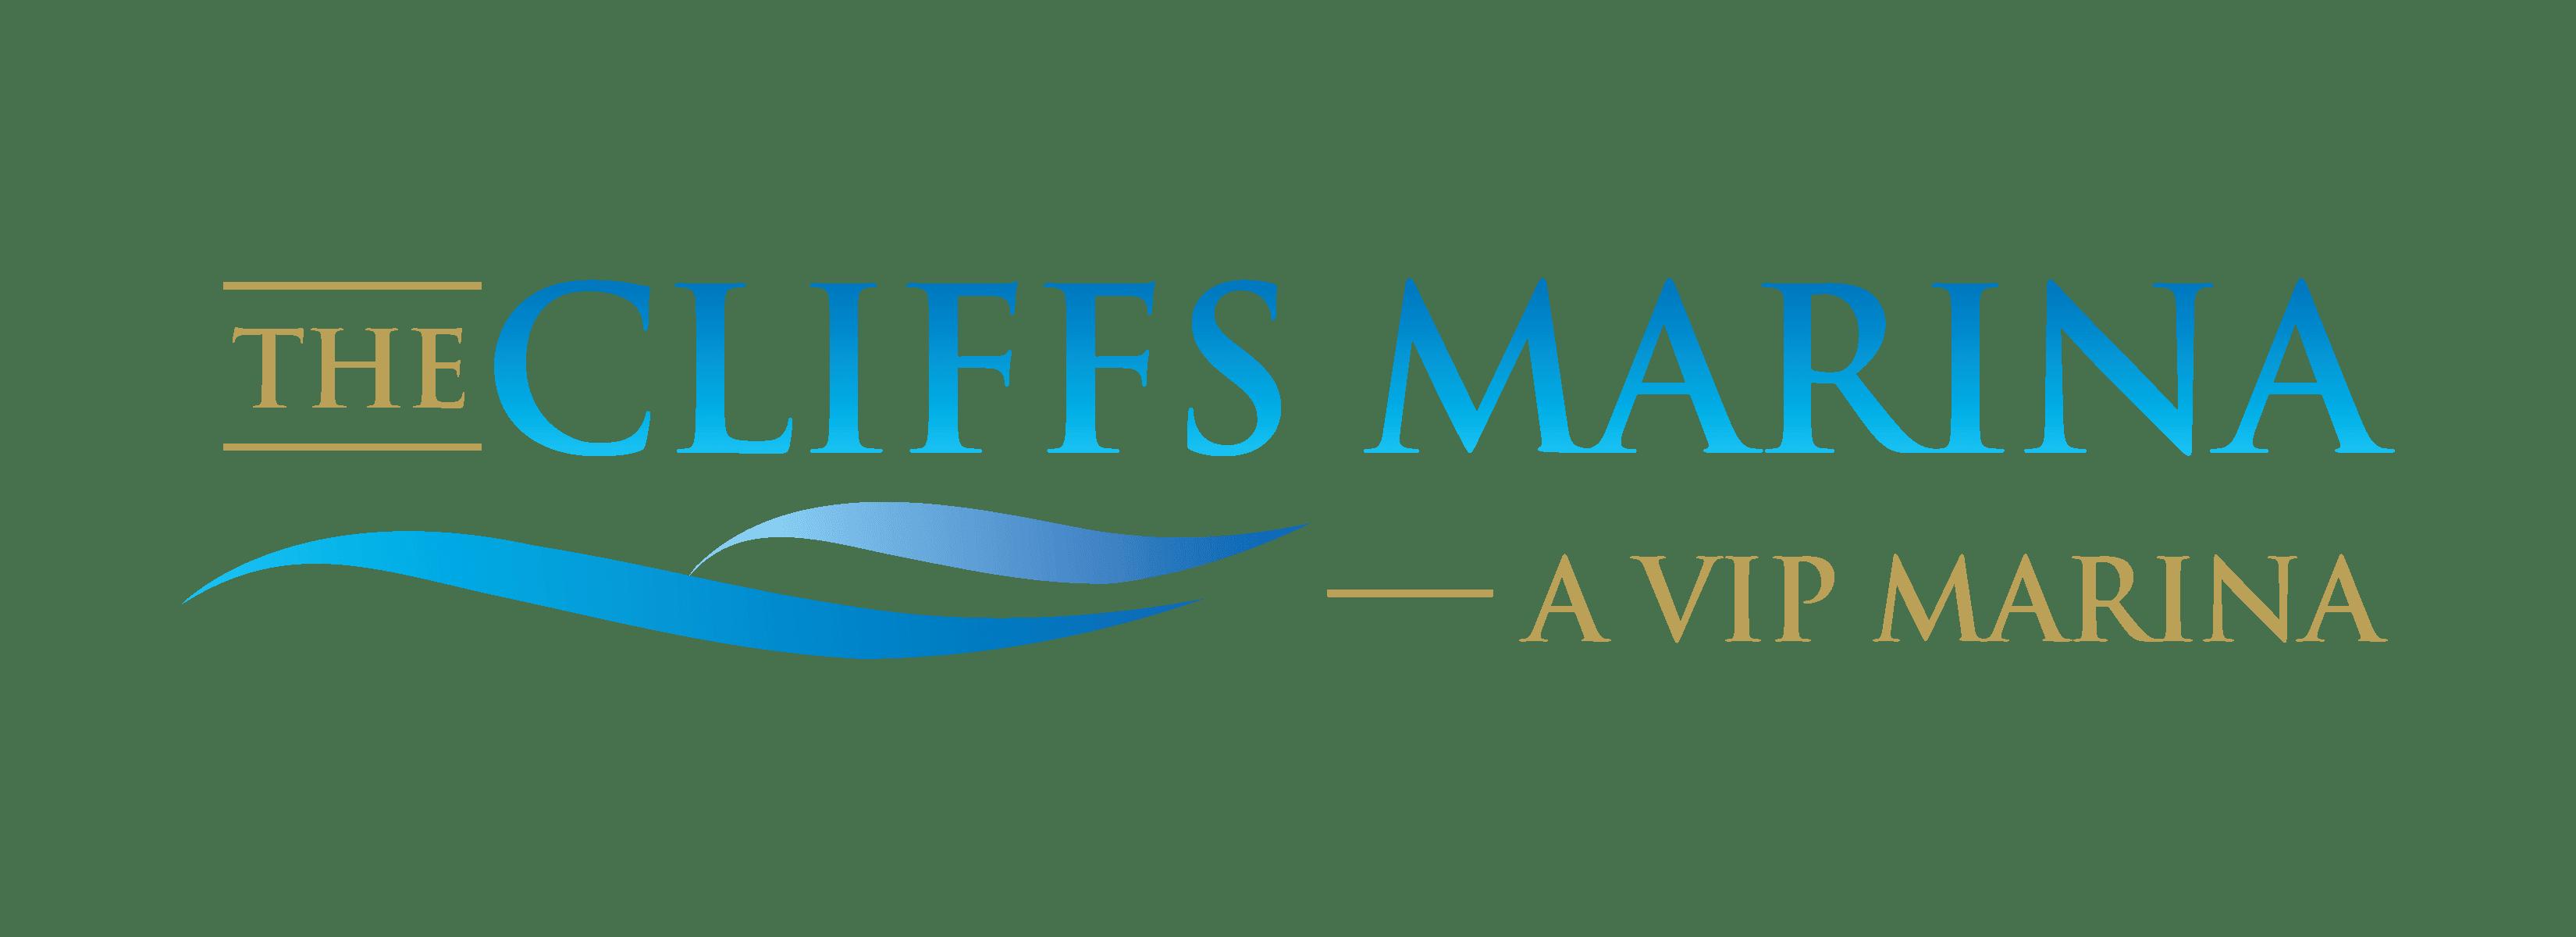 The Cliffs Marina